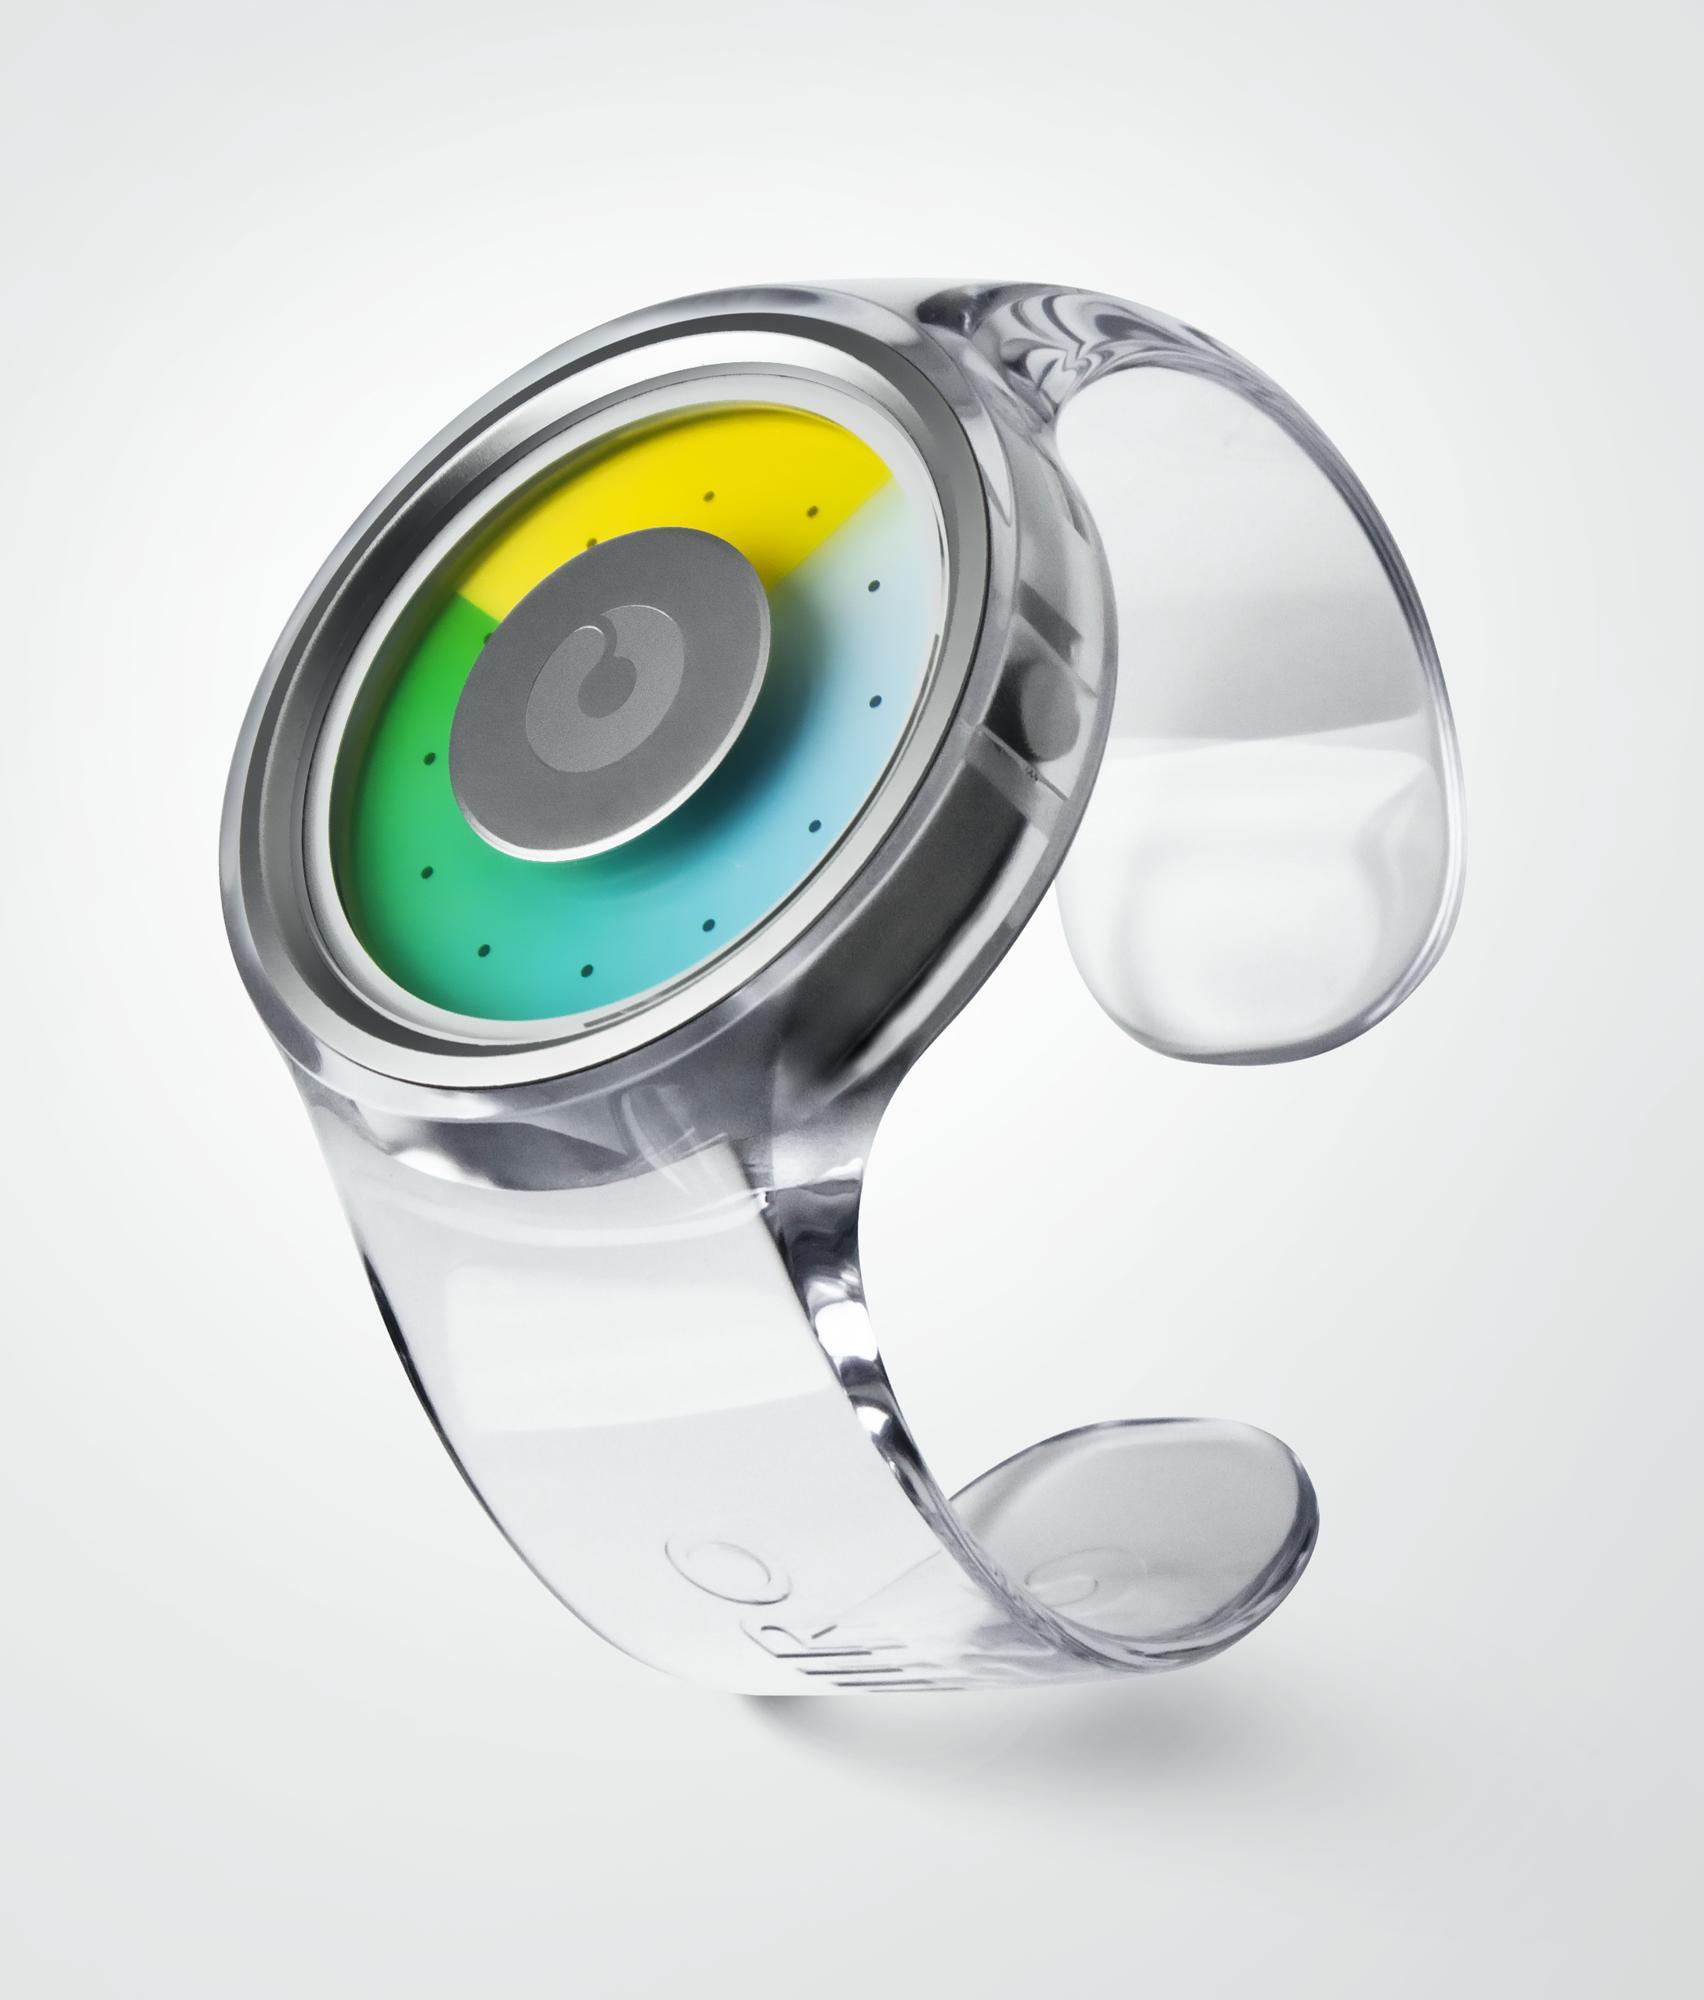 Пинкл (Pinkl) | ZIIIRO Proton Transparent | Ziiiro Proton Transparent